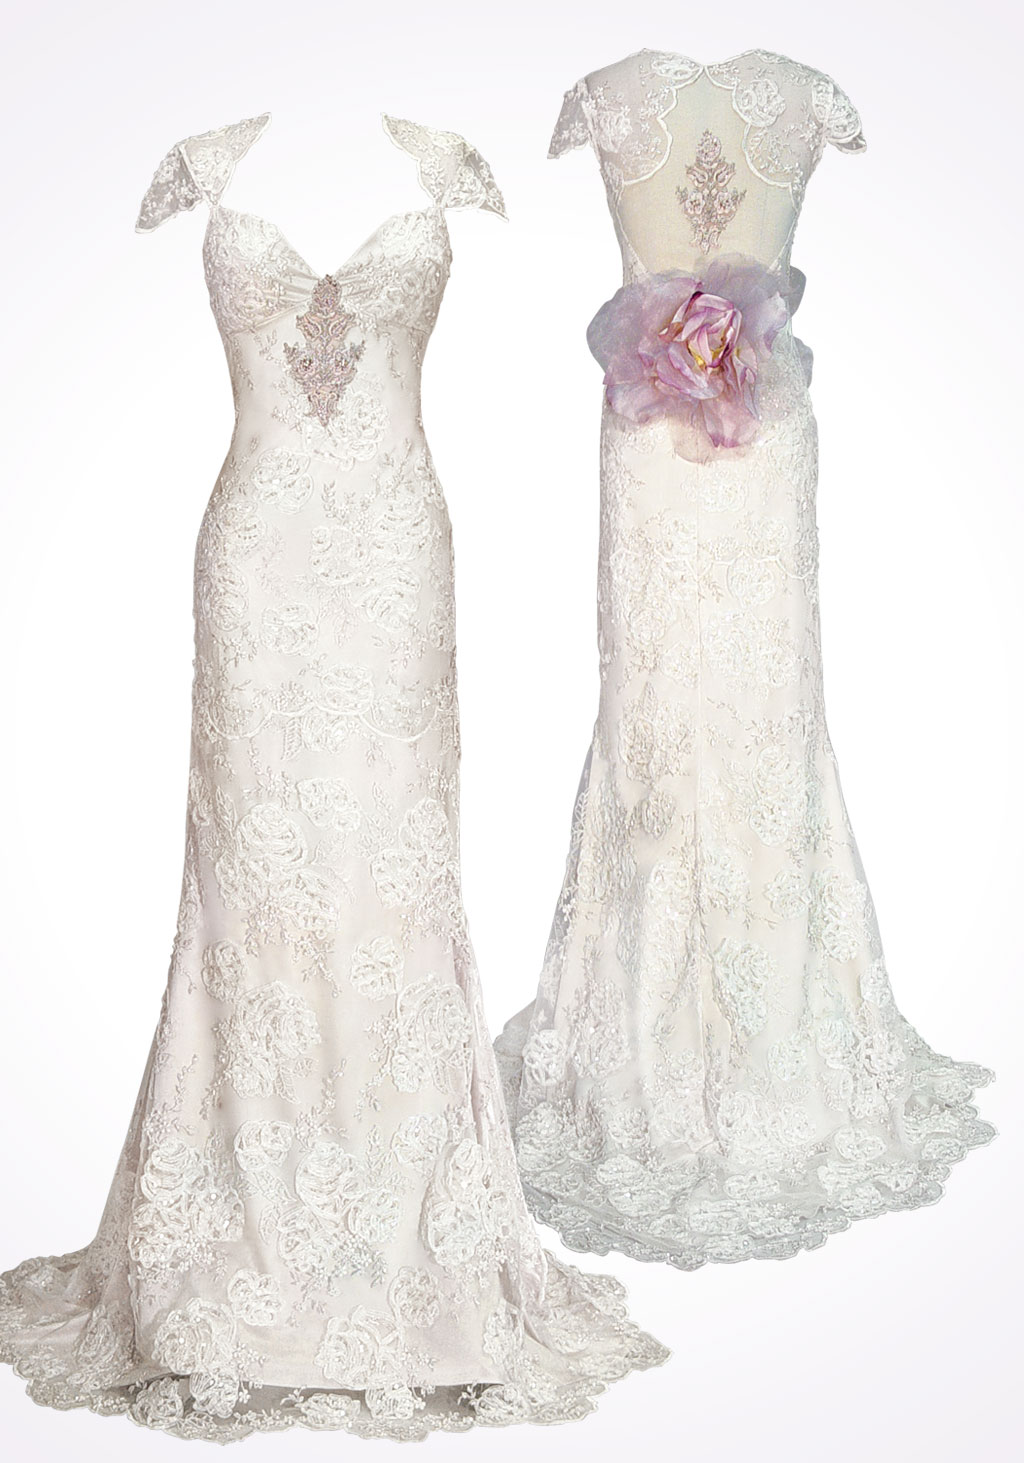 Claire Pettibone's Mystere Weddig Dress